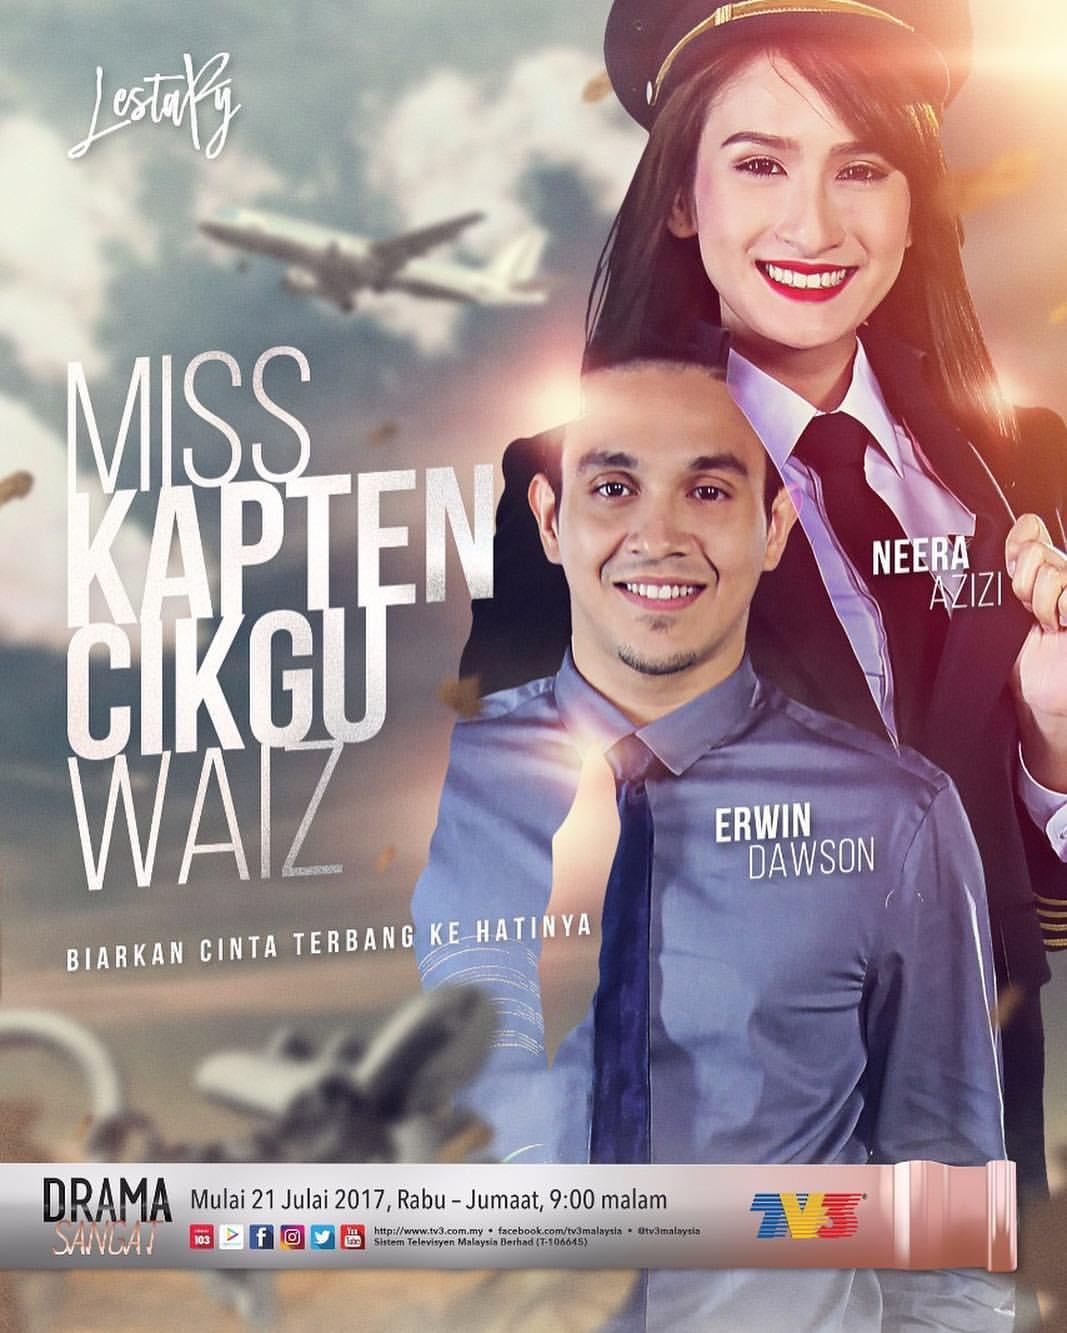 Hot! Drama Miss Kapten Cikgu Waiz